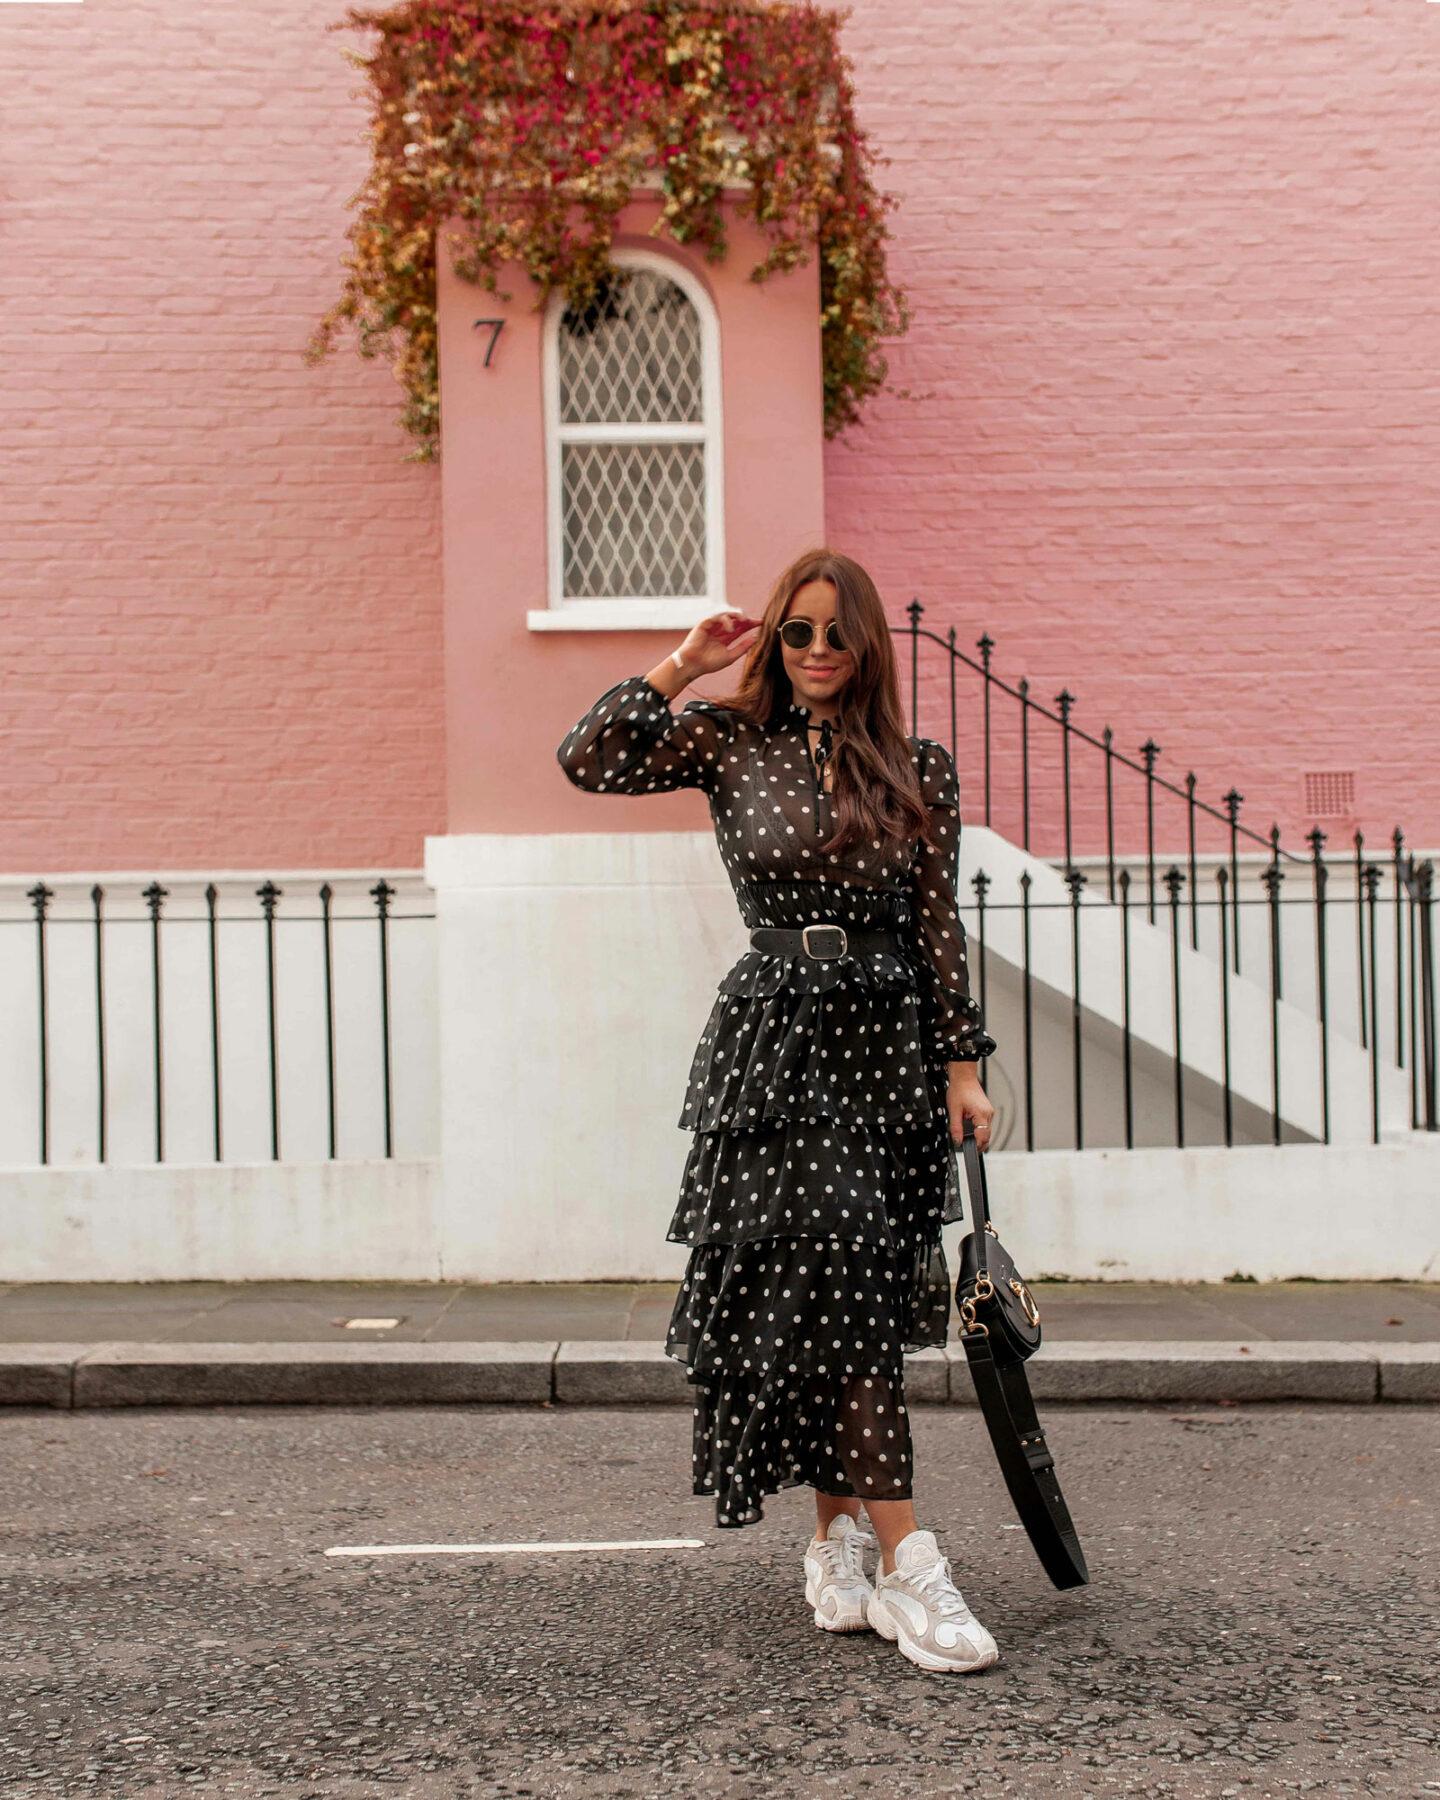 3-kelseyinlondon_kelsey_heinrichs_london_blogger_photographer_influencer_workshop_adobe